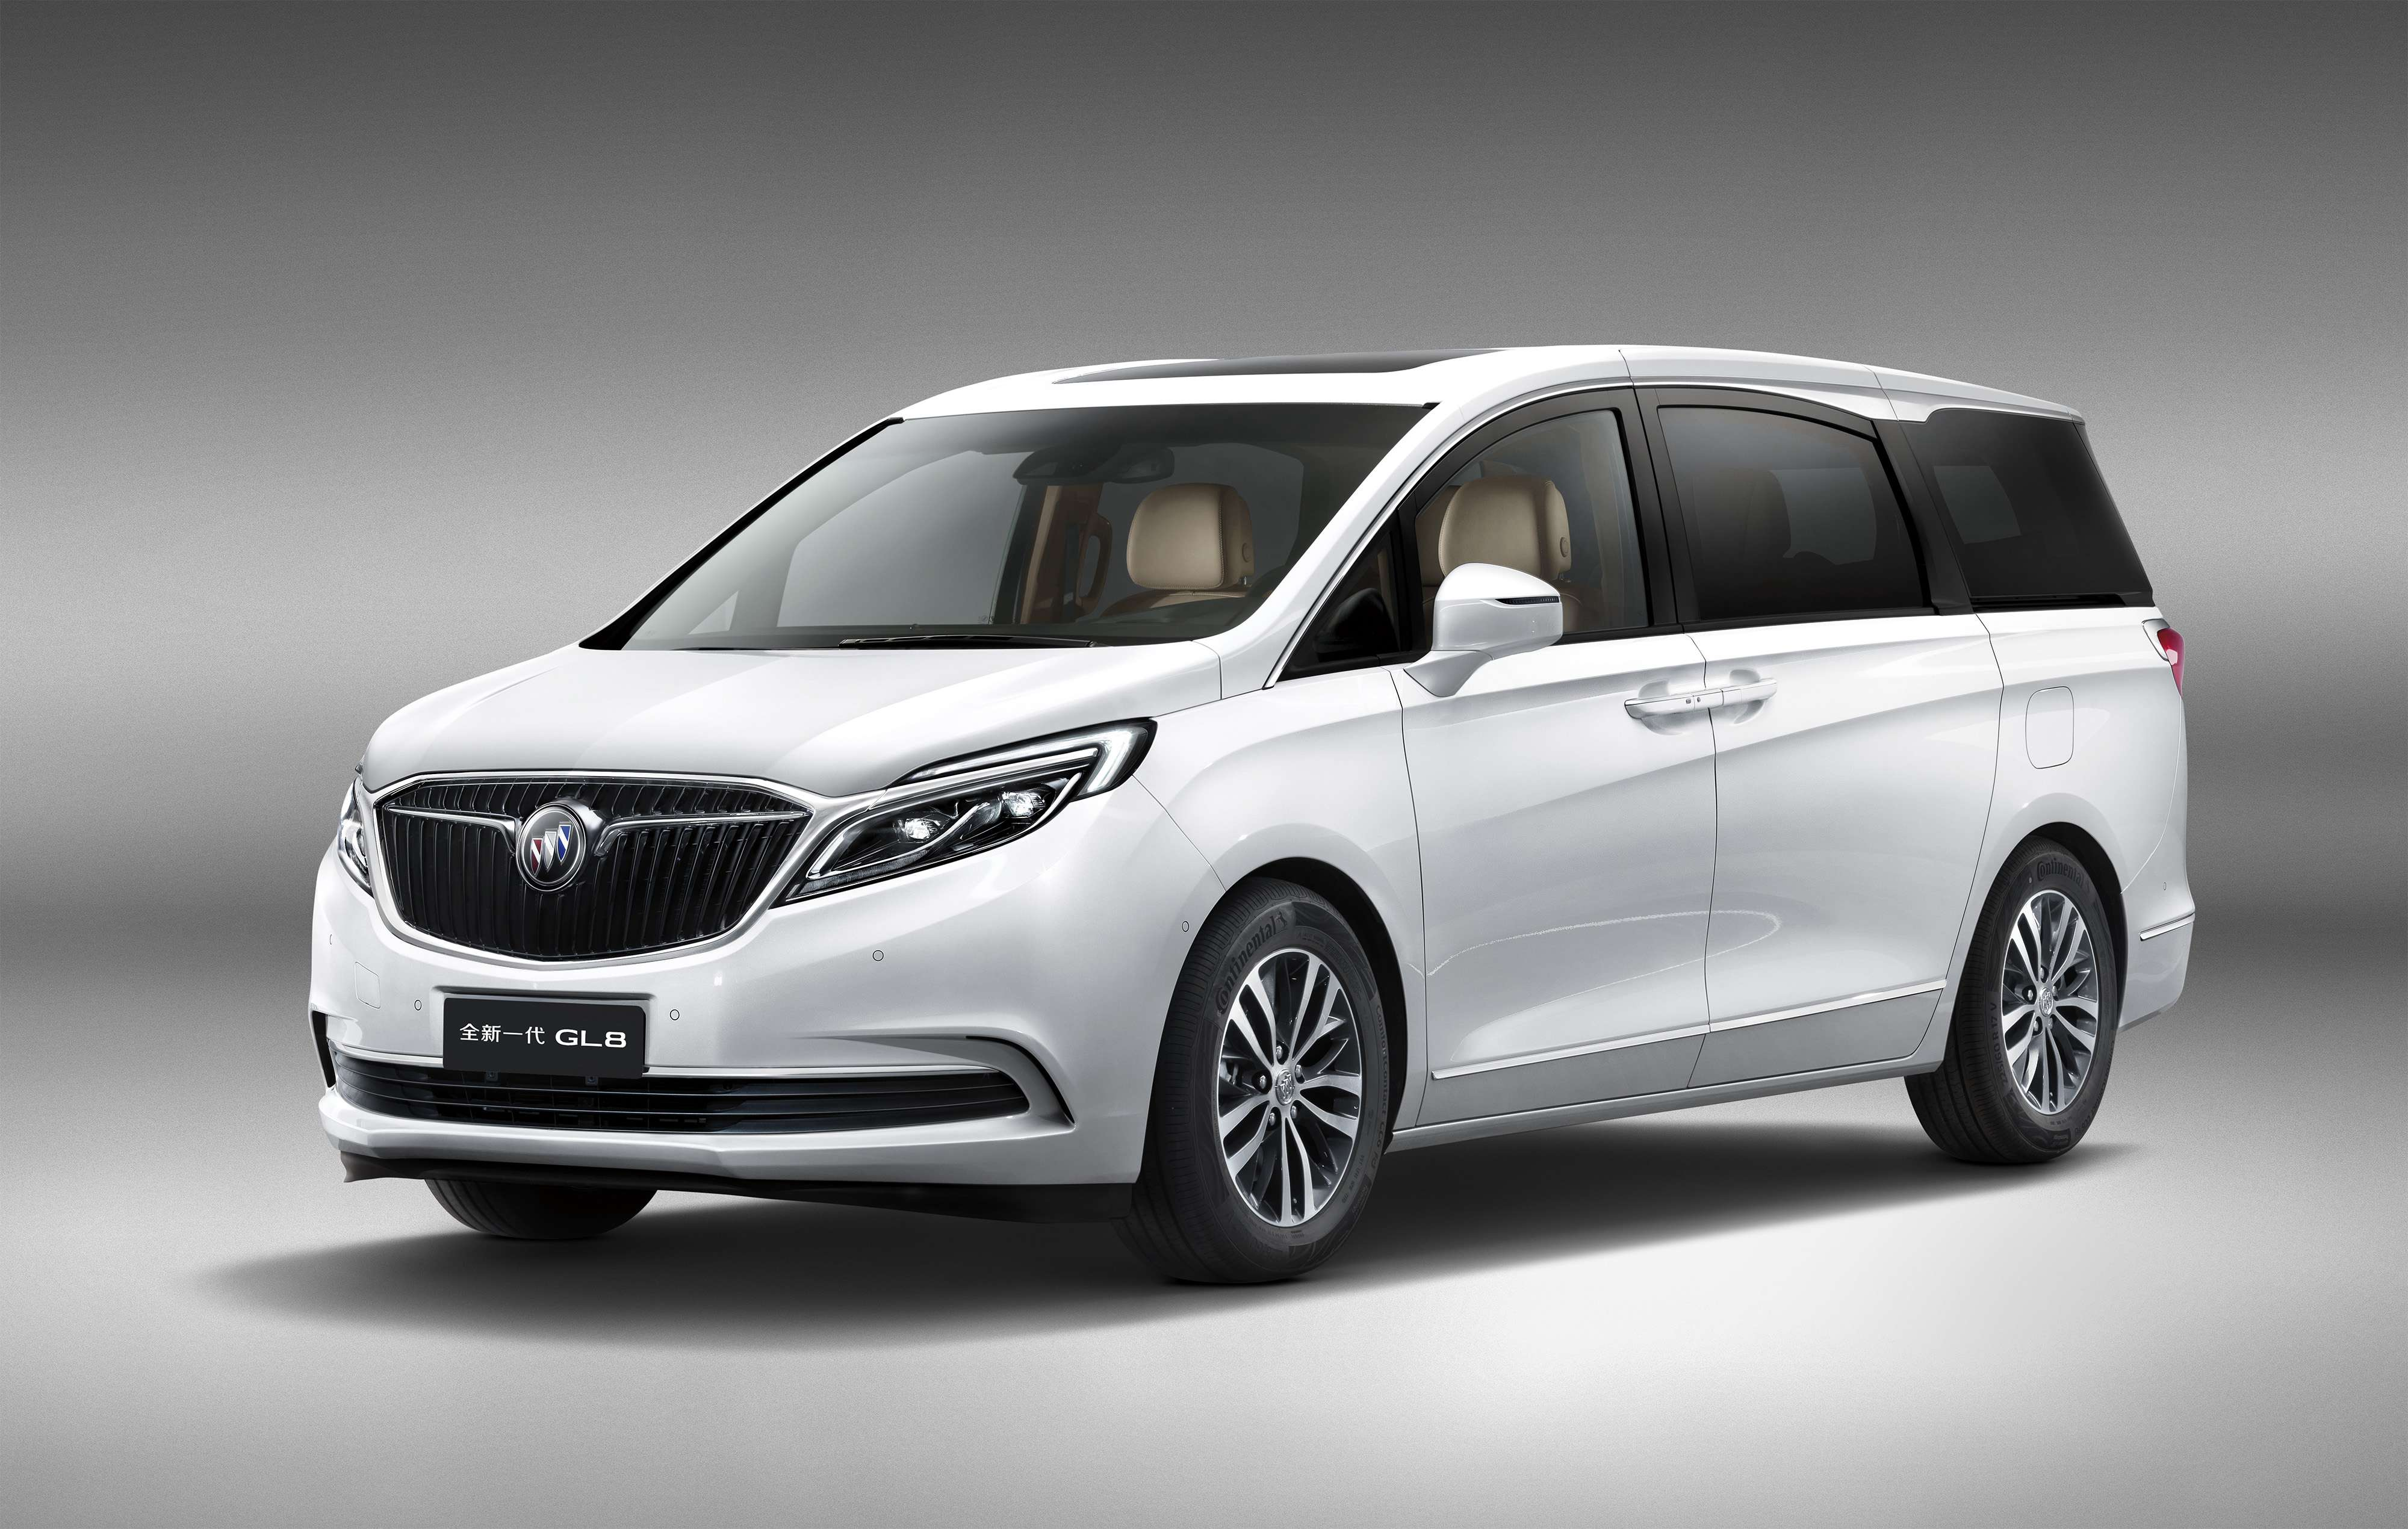 SAIC General Motors Unveils 2017 Buick GL8 Minivan in China